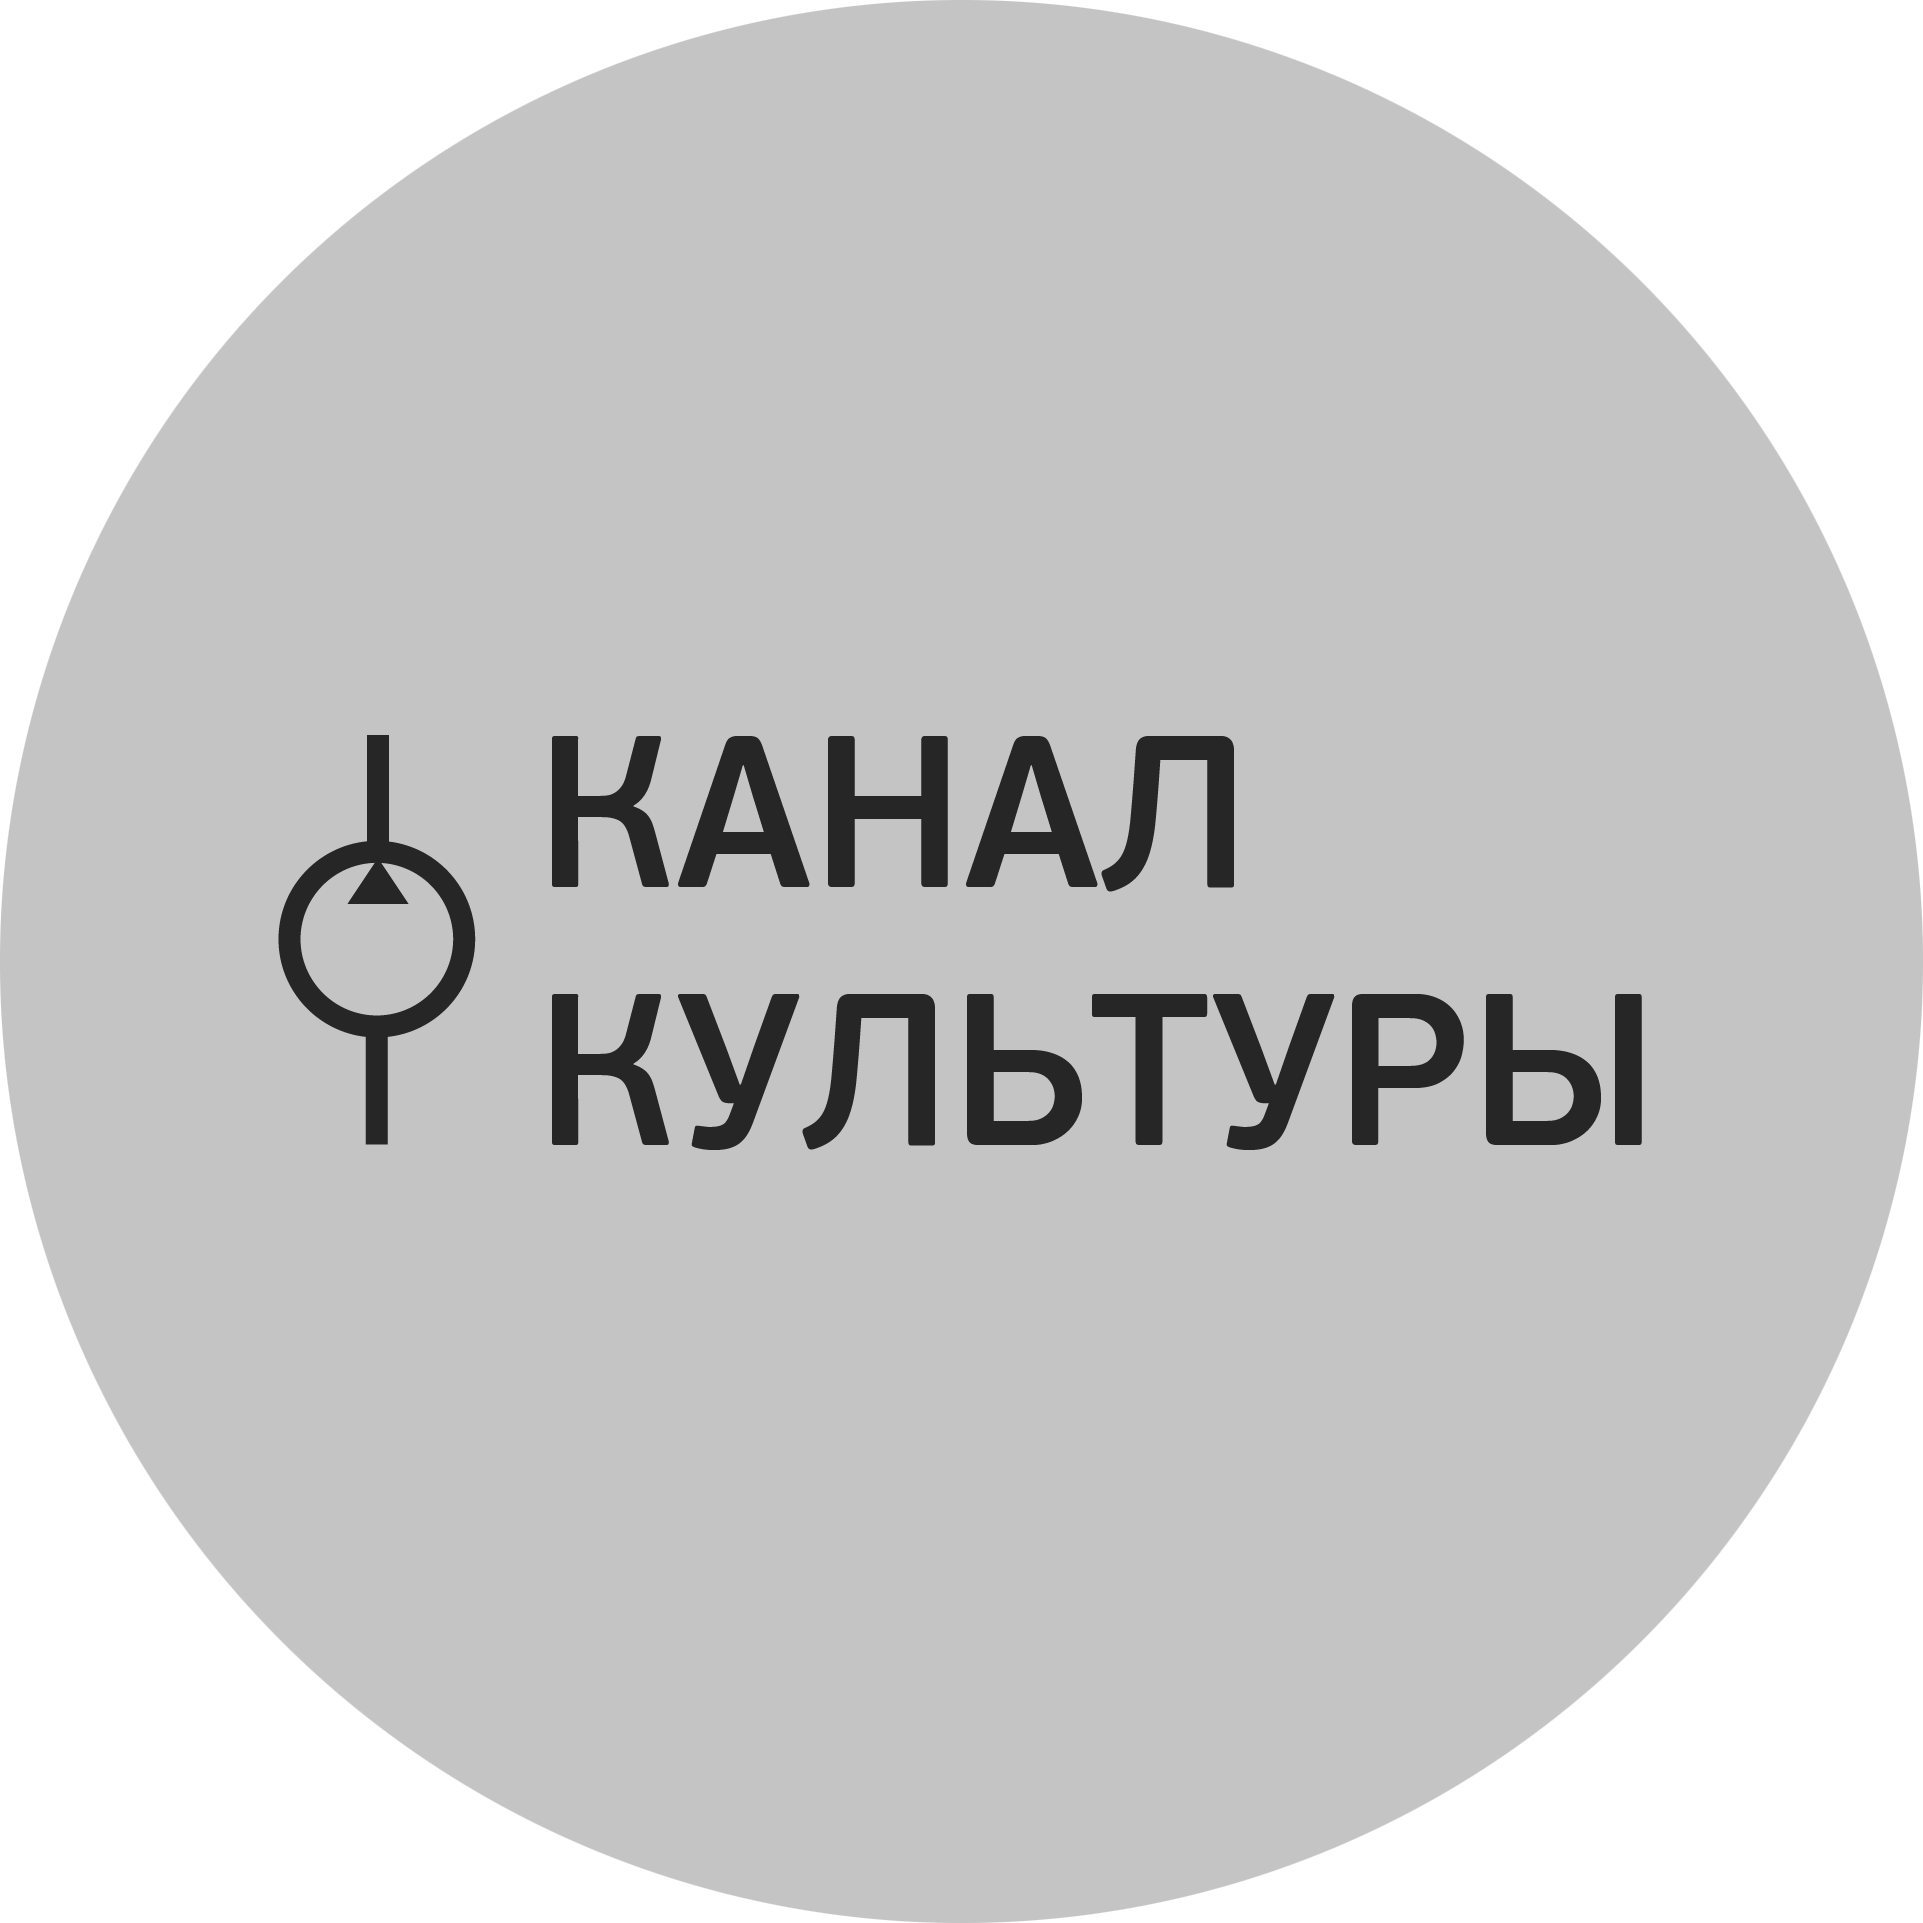 Логотип летнего кинотеатра